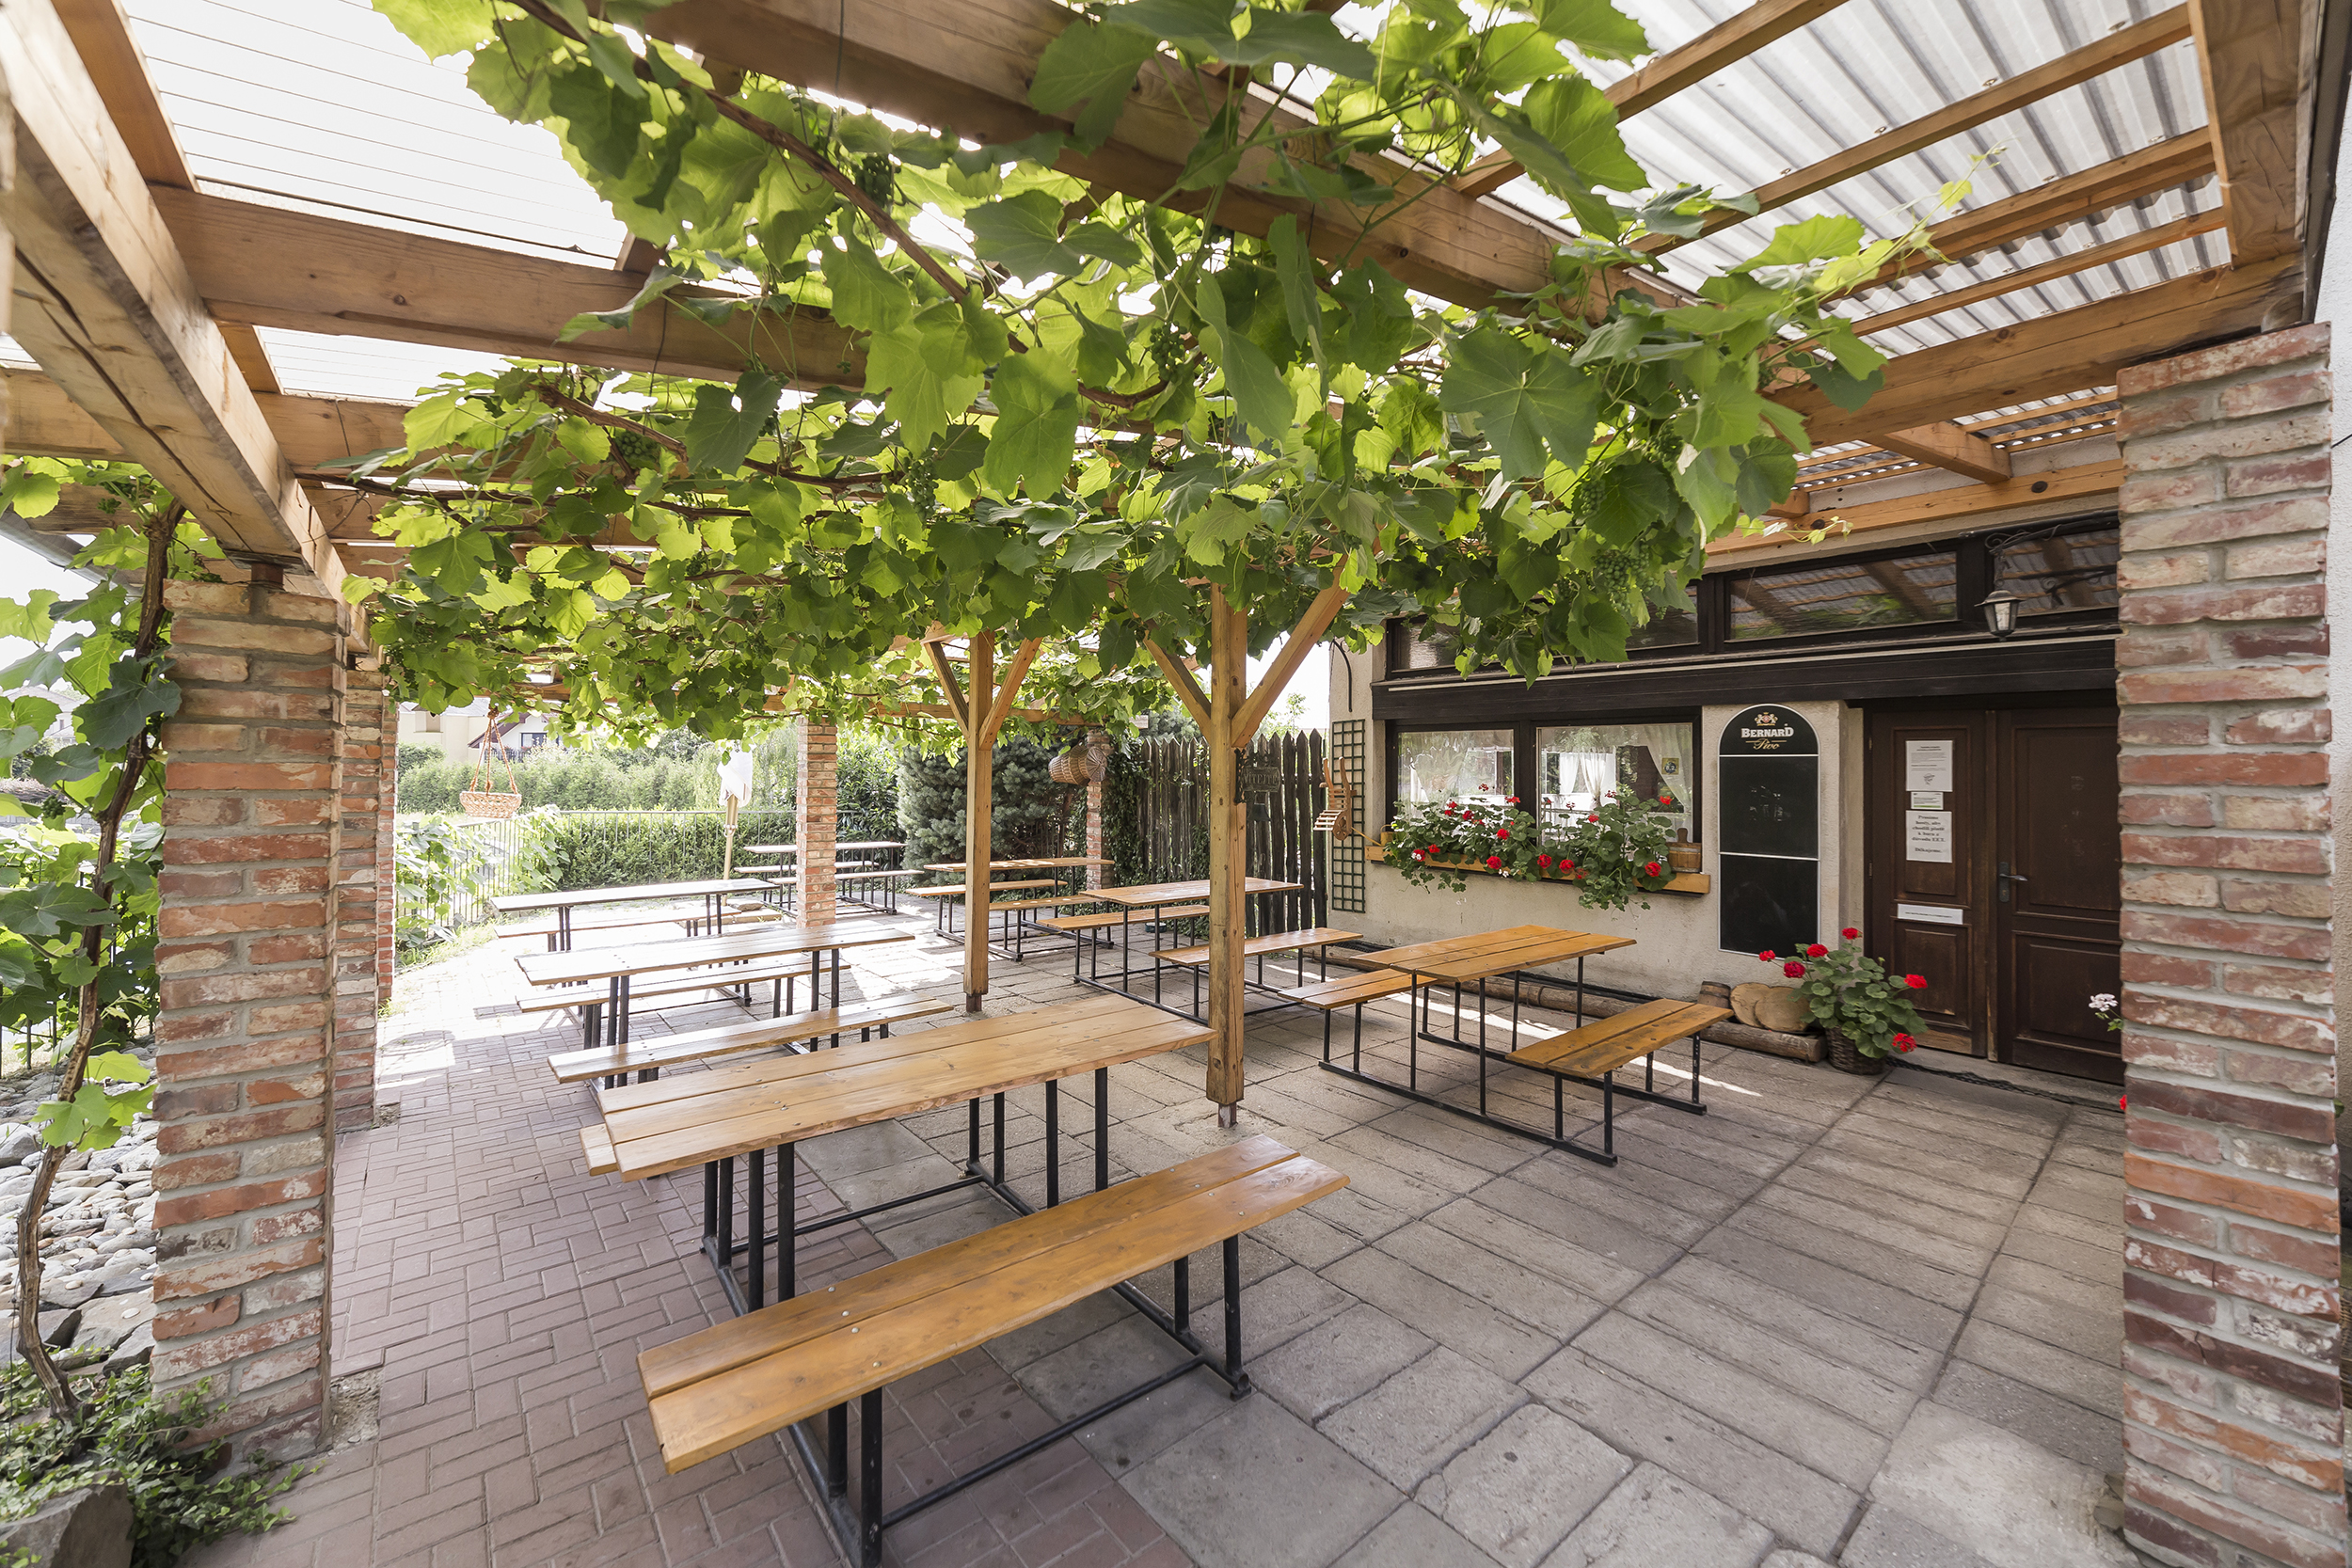 terasa lavicka restaurace vino strecha cihla kvetina